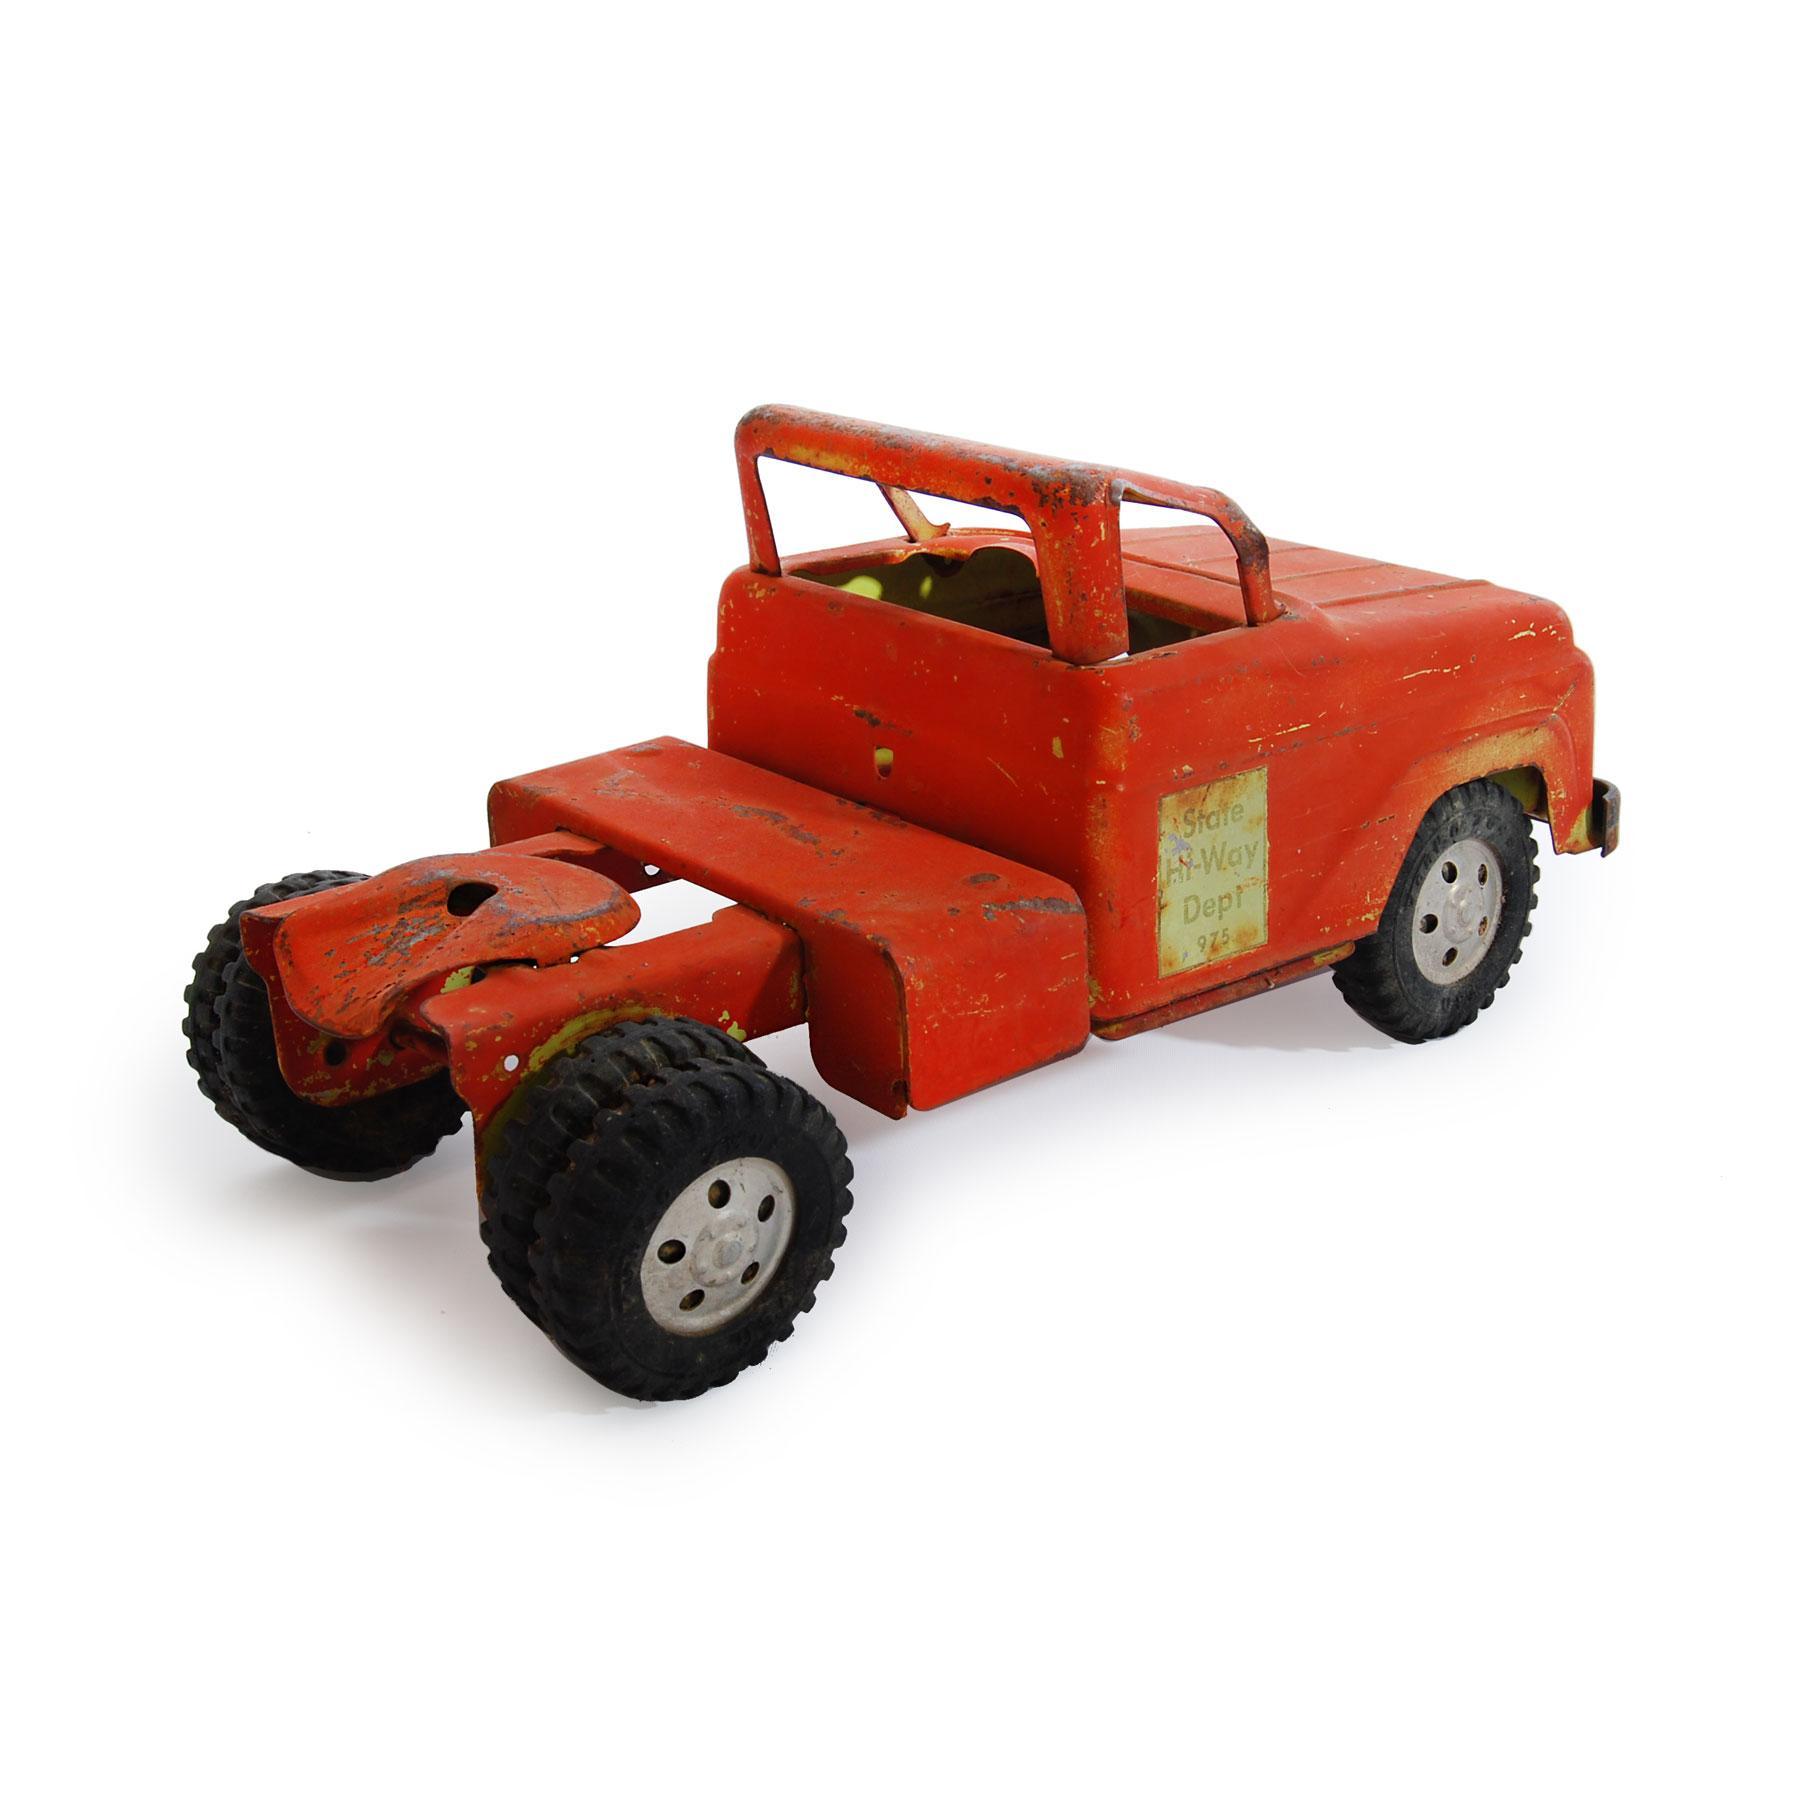 1950s Tonka quotState Hi Wayquot Tow Truck Vintage Toy Chairish : 2f9404e7 56dc 45b1 8795 614129aa6062aspectfitampwidth640ampheight640 from www.chairish.com size 640 x 640 jpeg 27kB